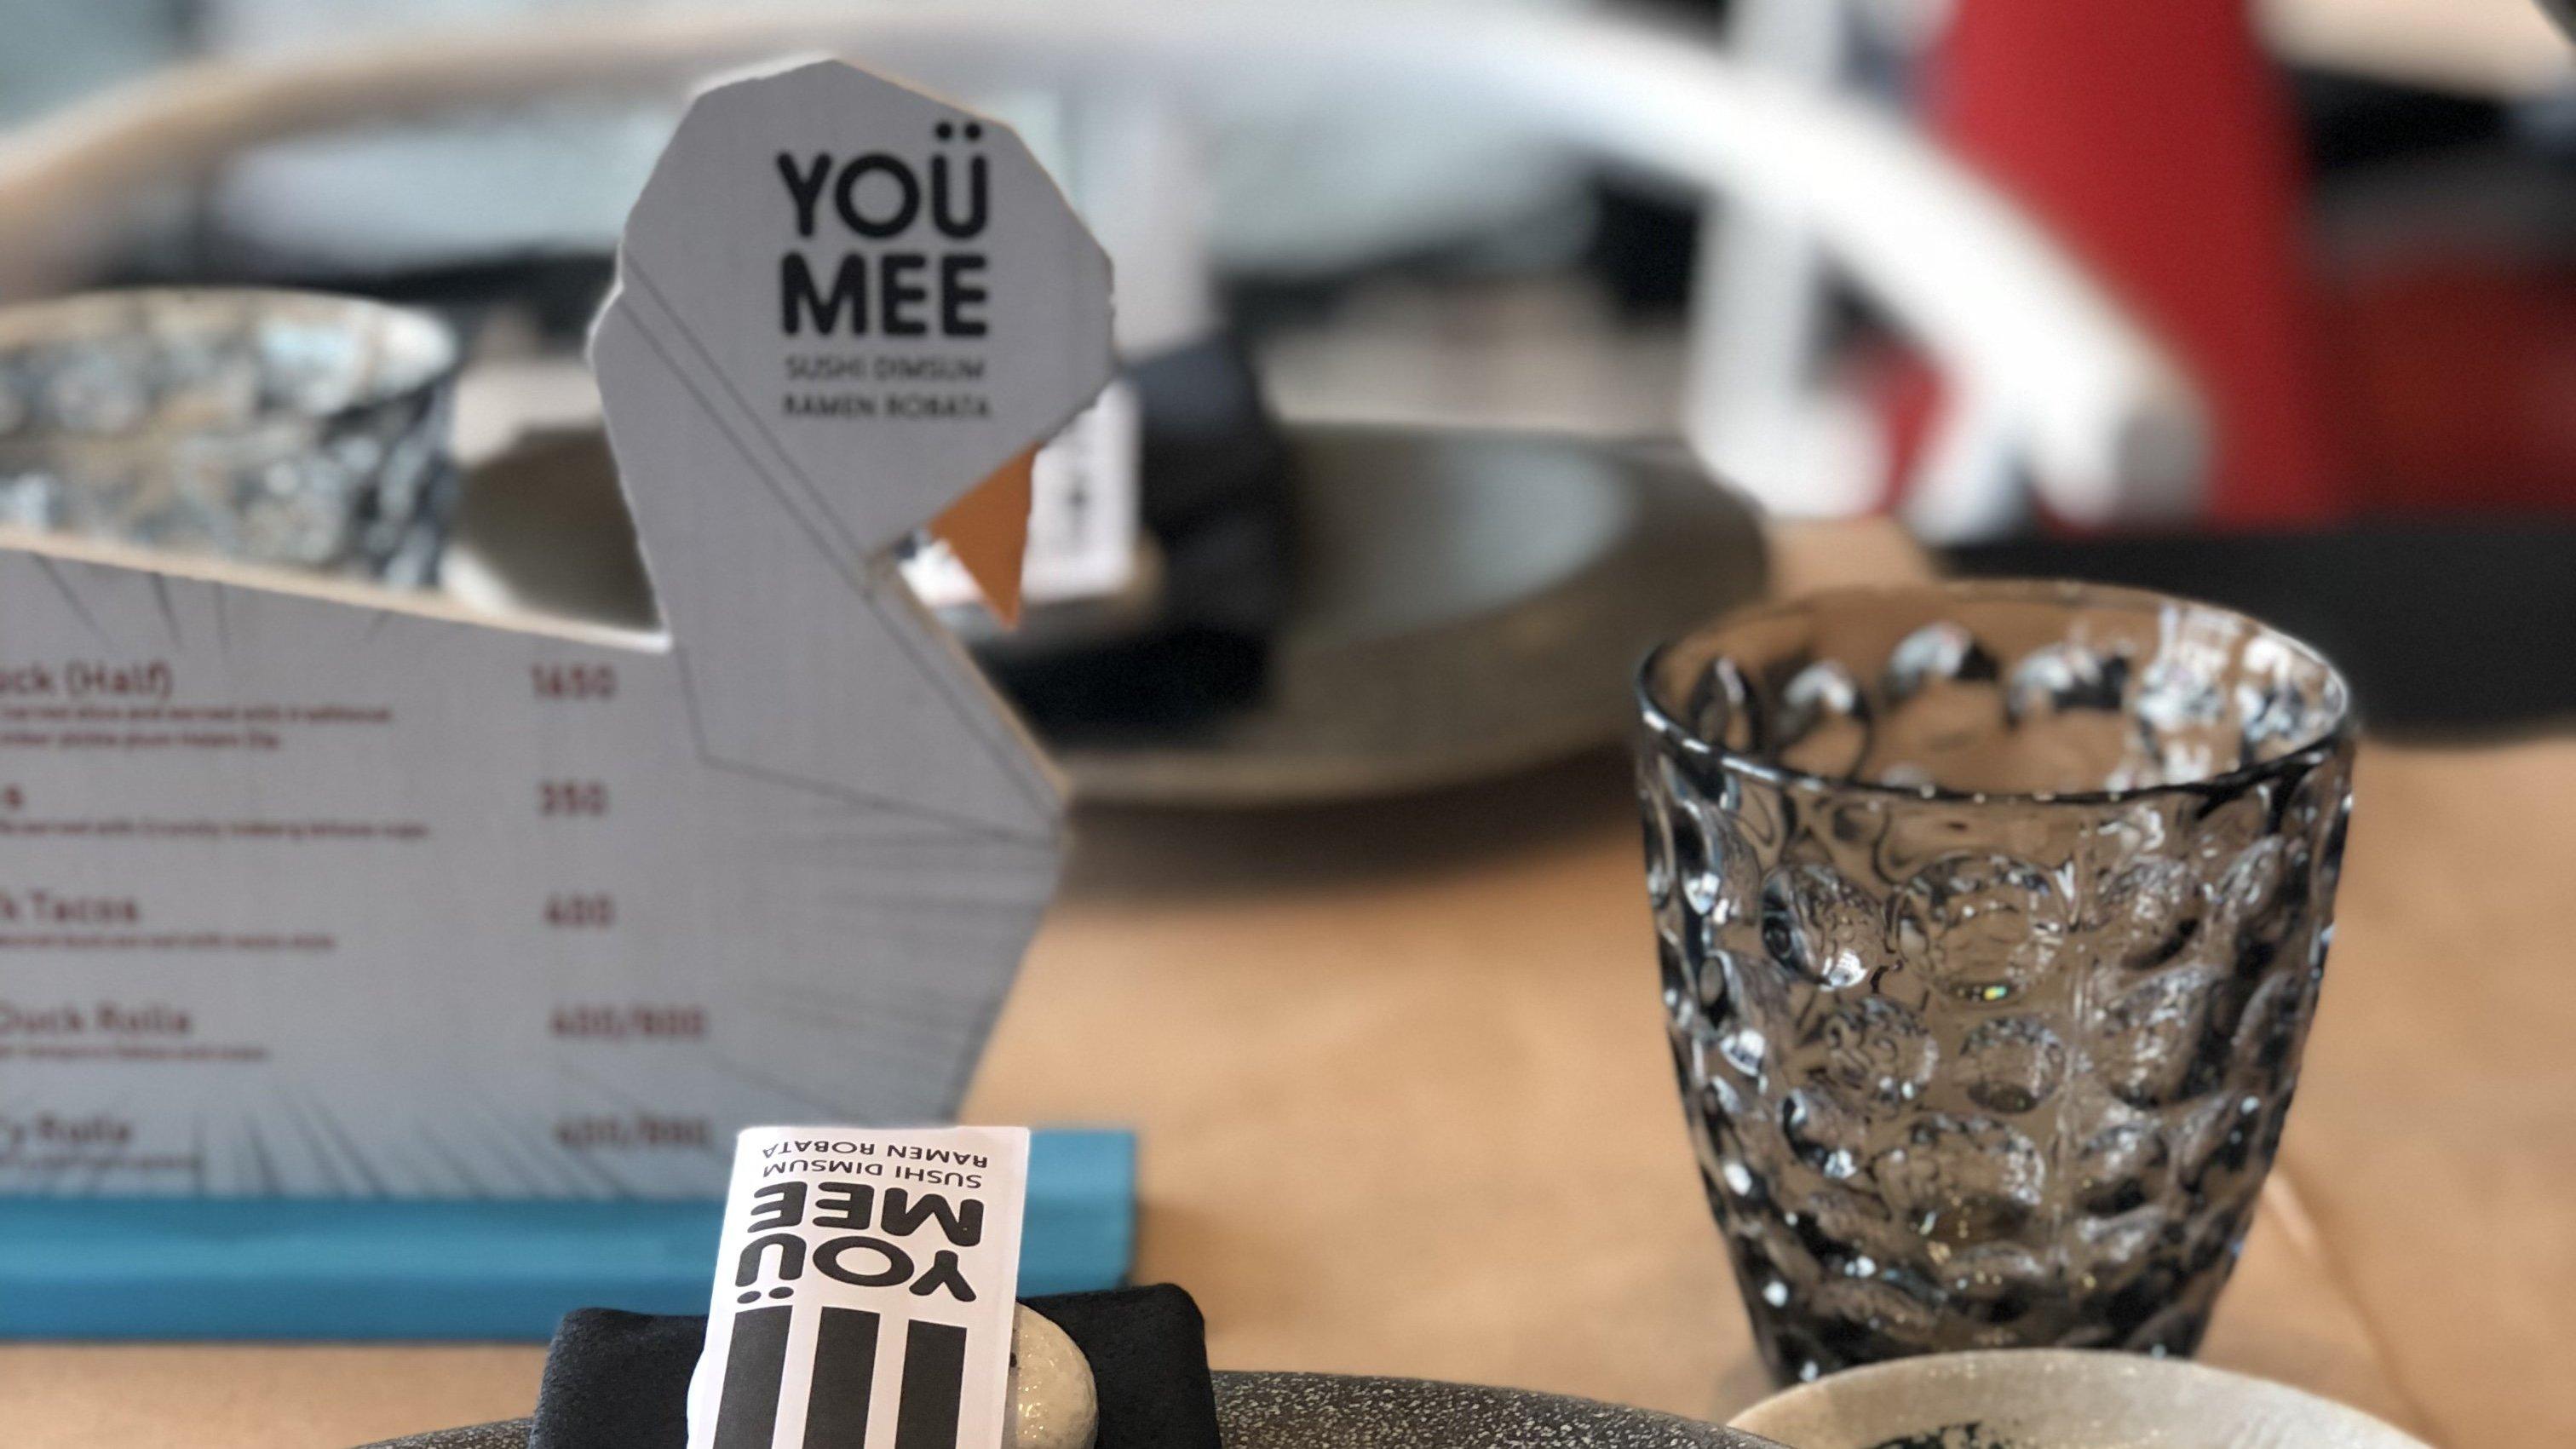 YouMee – A dining experience Restaurant at Forum Shantiniketan